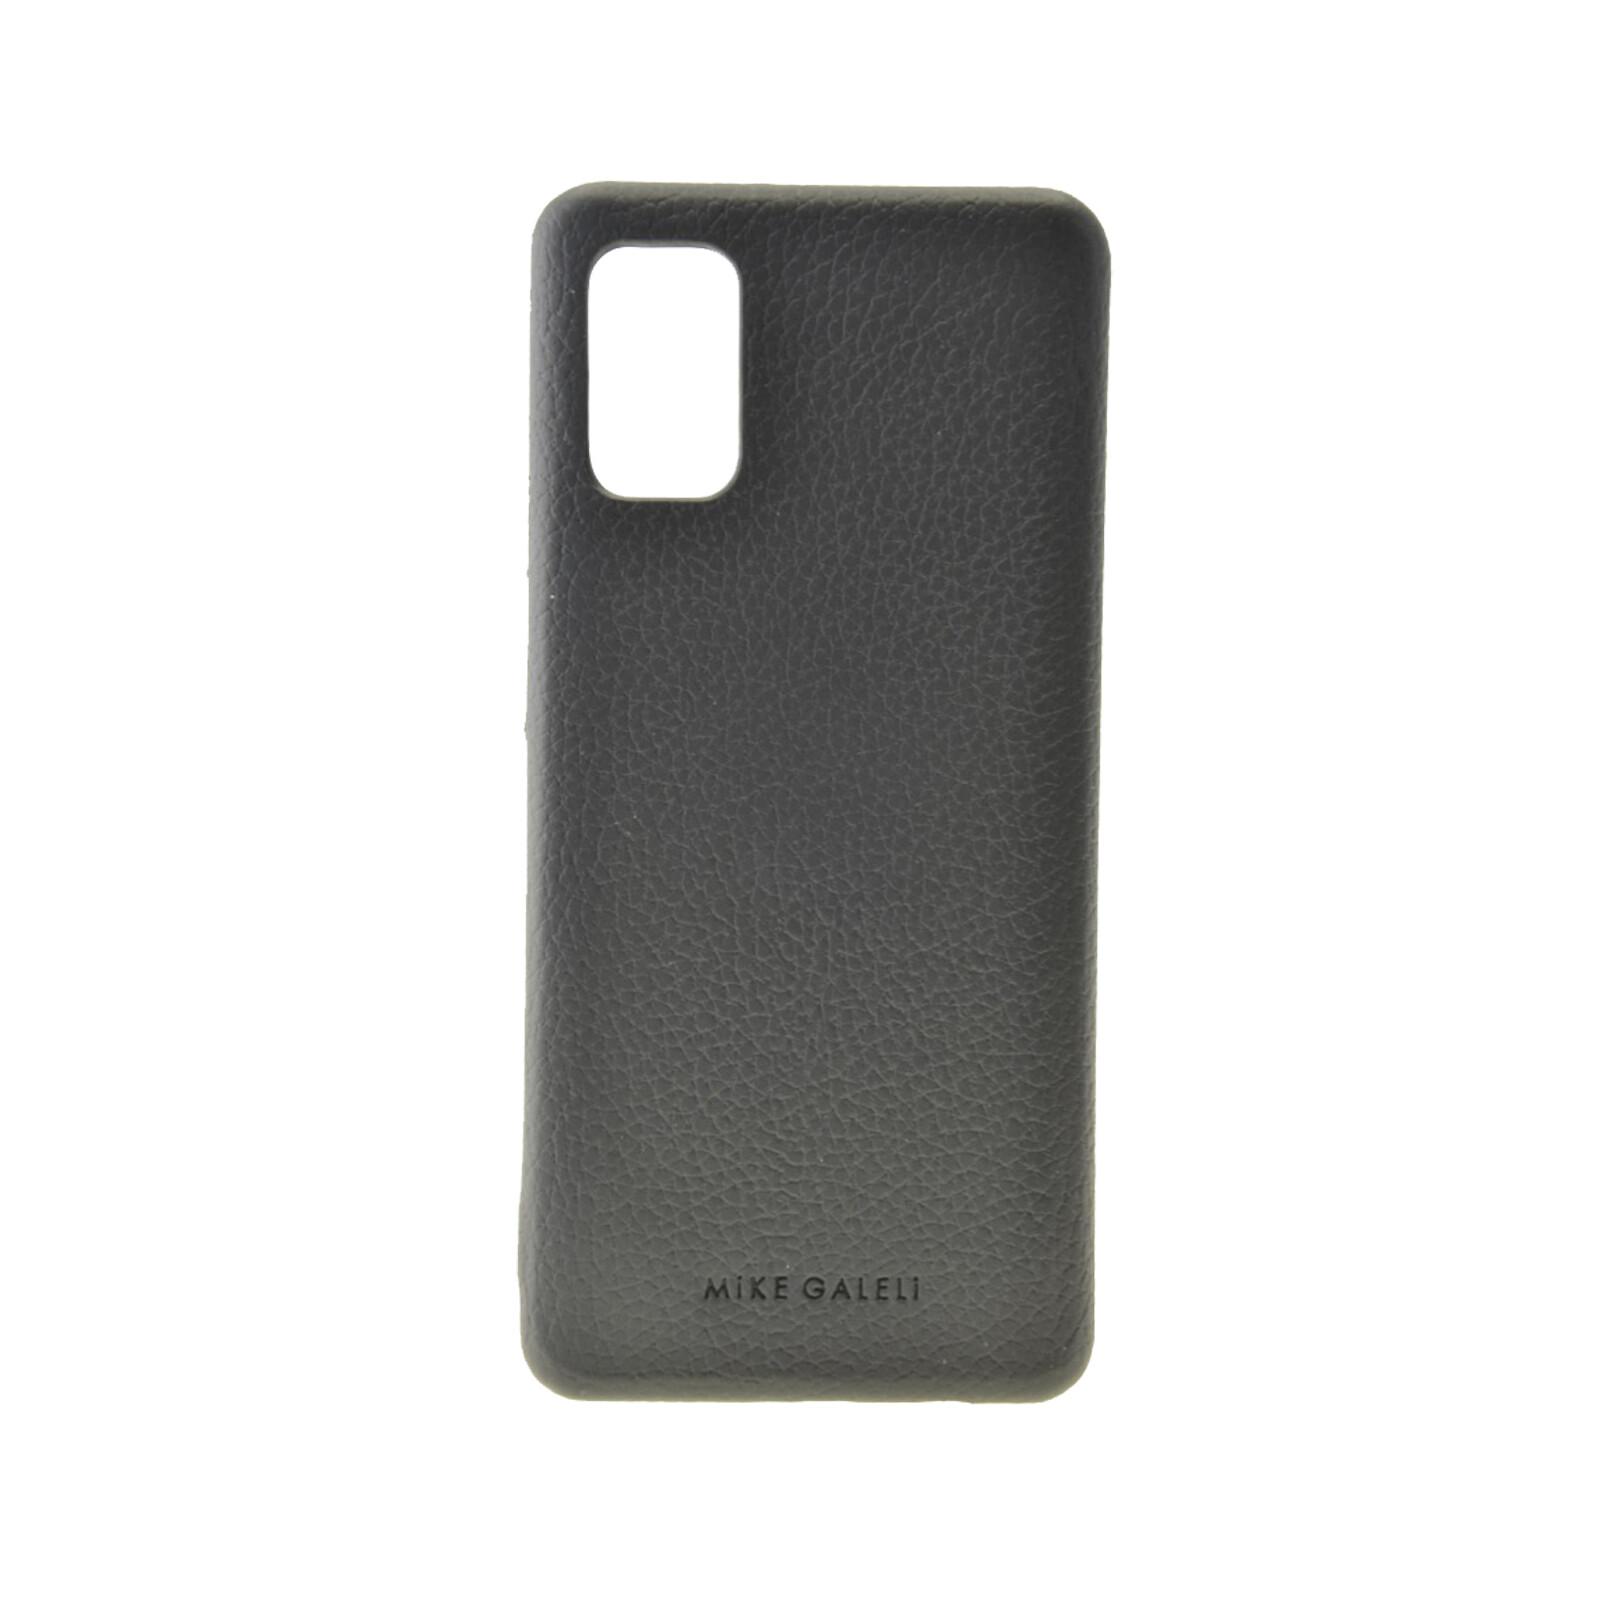 Galeli Backcover FINN Samsung Galaxy S20+ schwarz